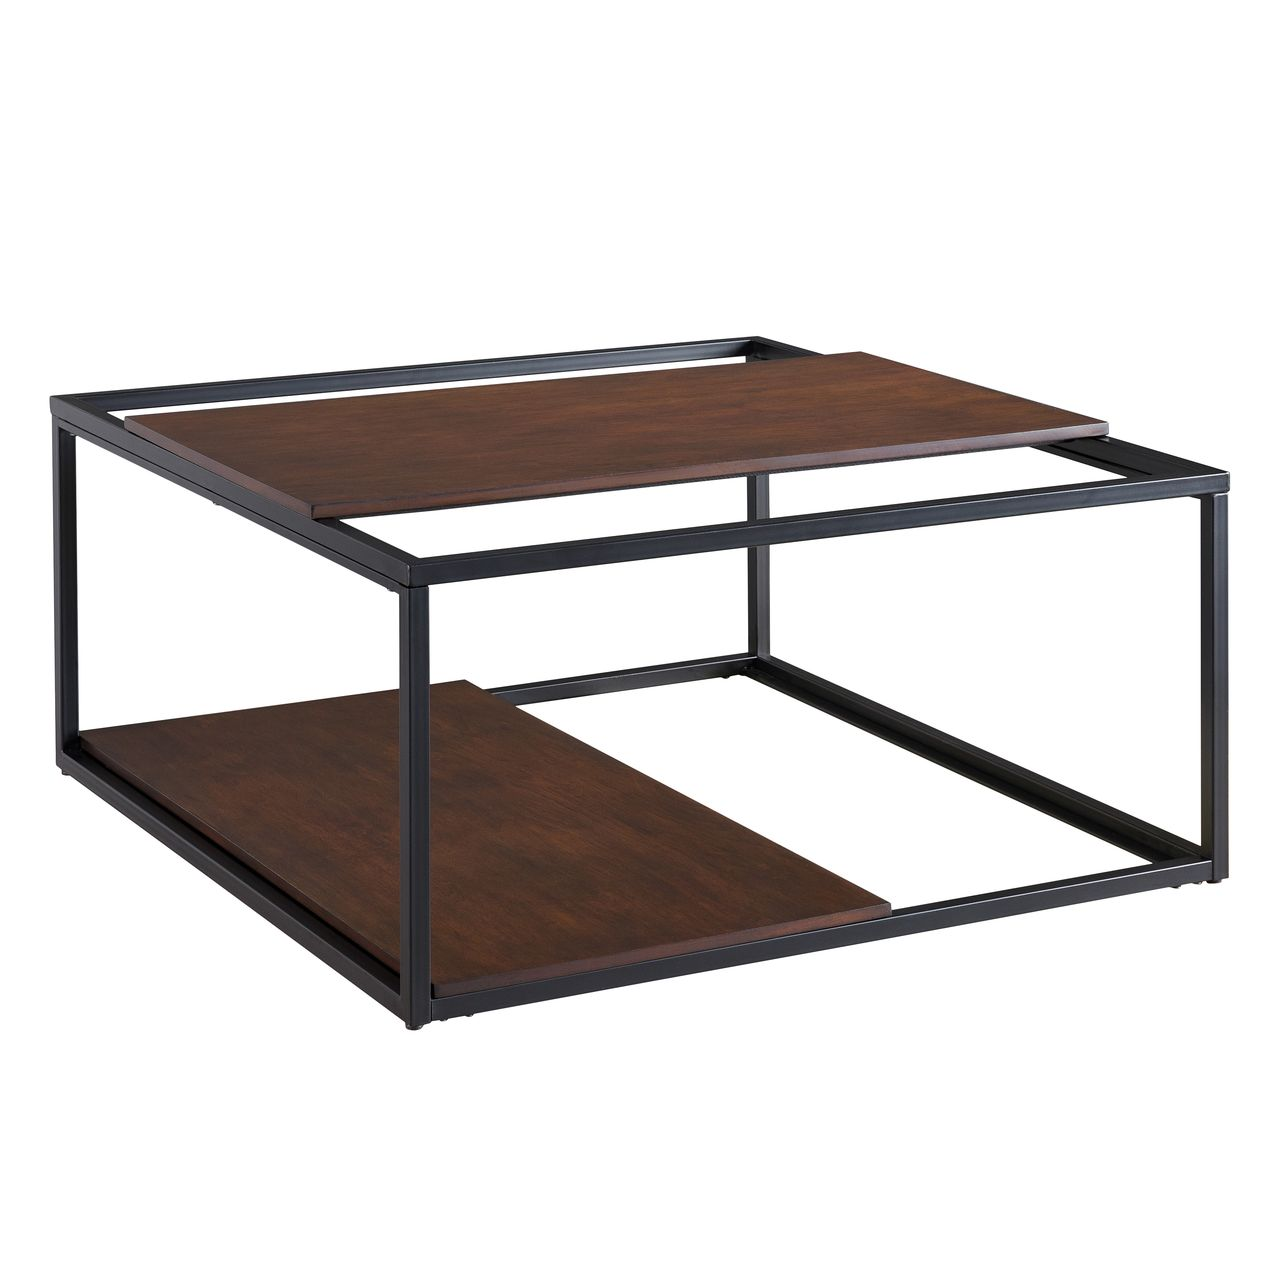 Holly & Martin Decklan Sliding Shelf Coffee Table in Tobacco / Black